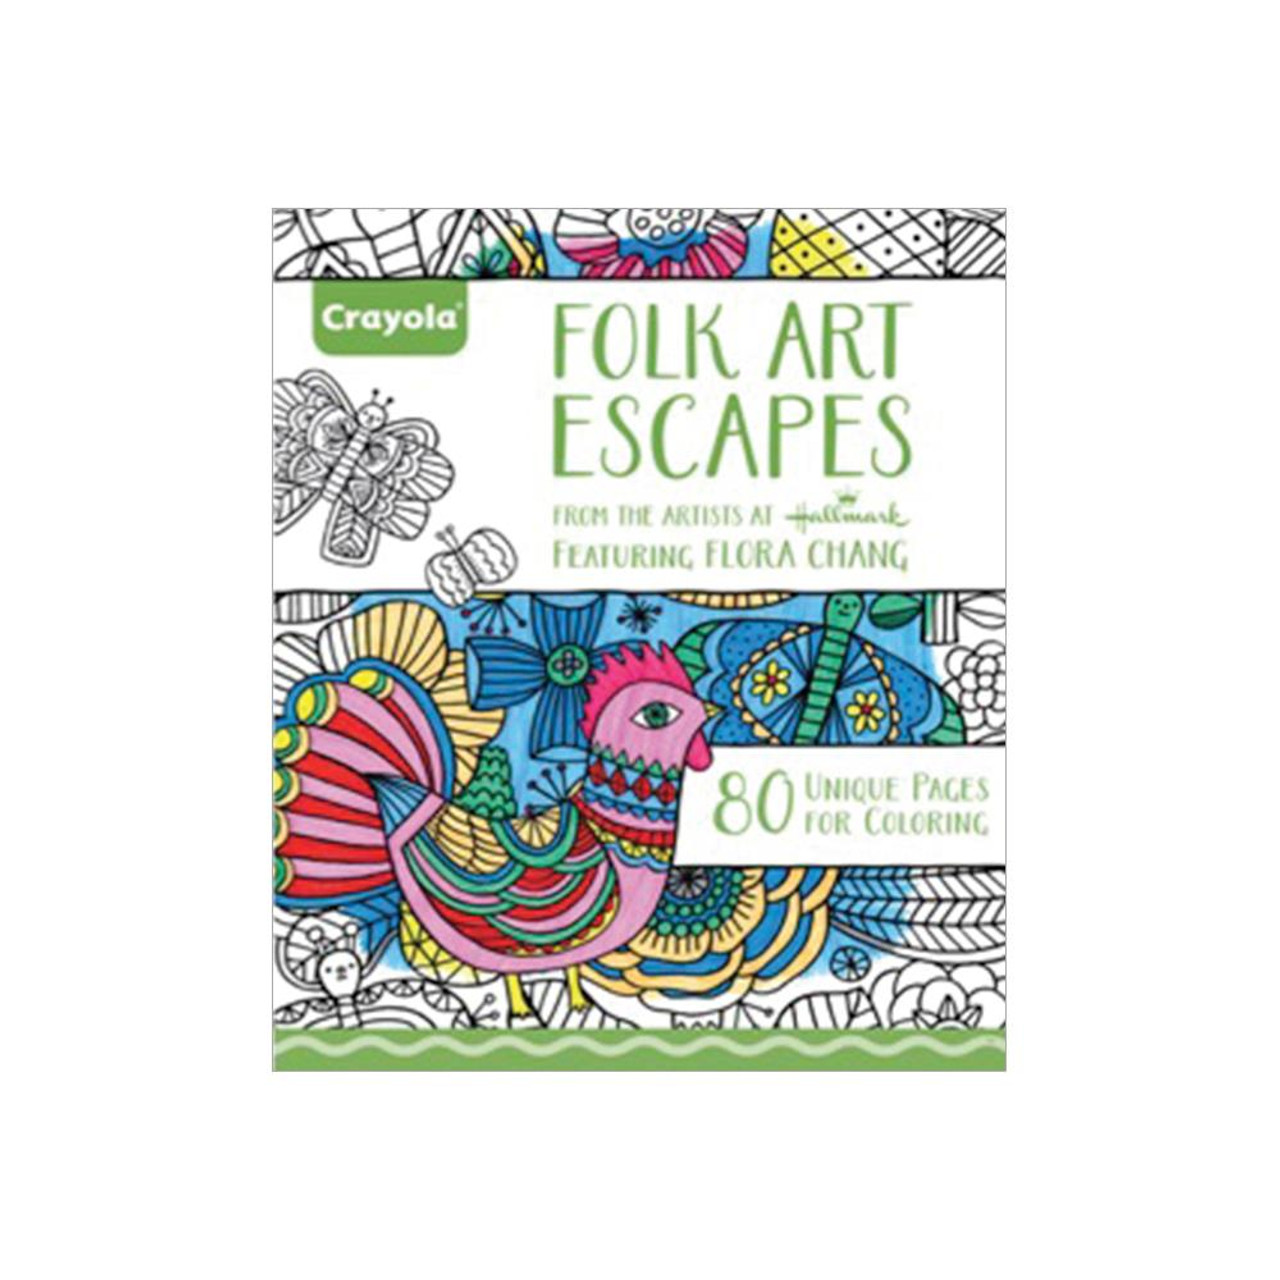 Crayola Coloring Books: Folk Art Escapes